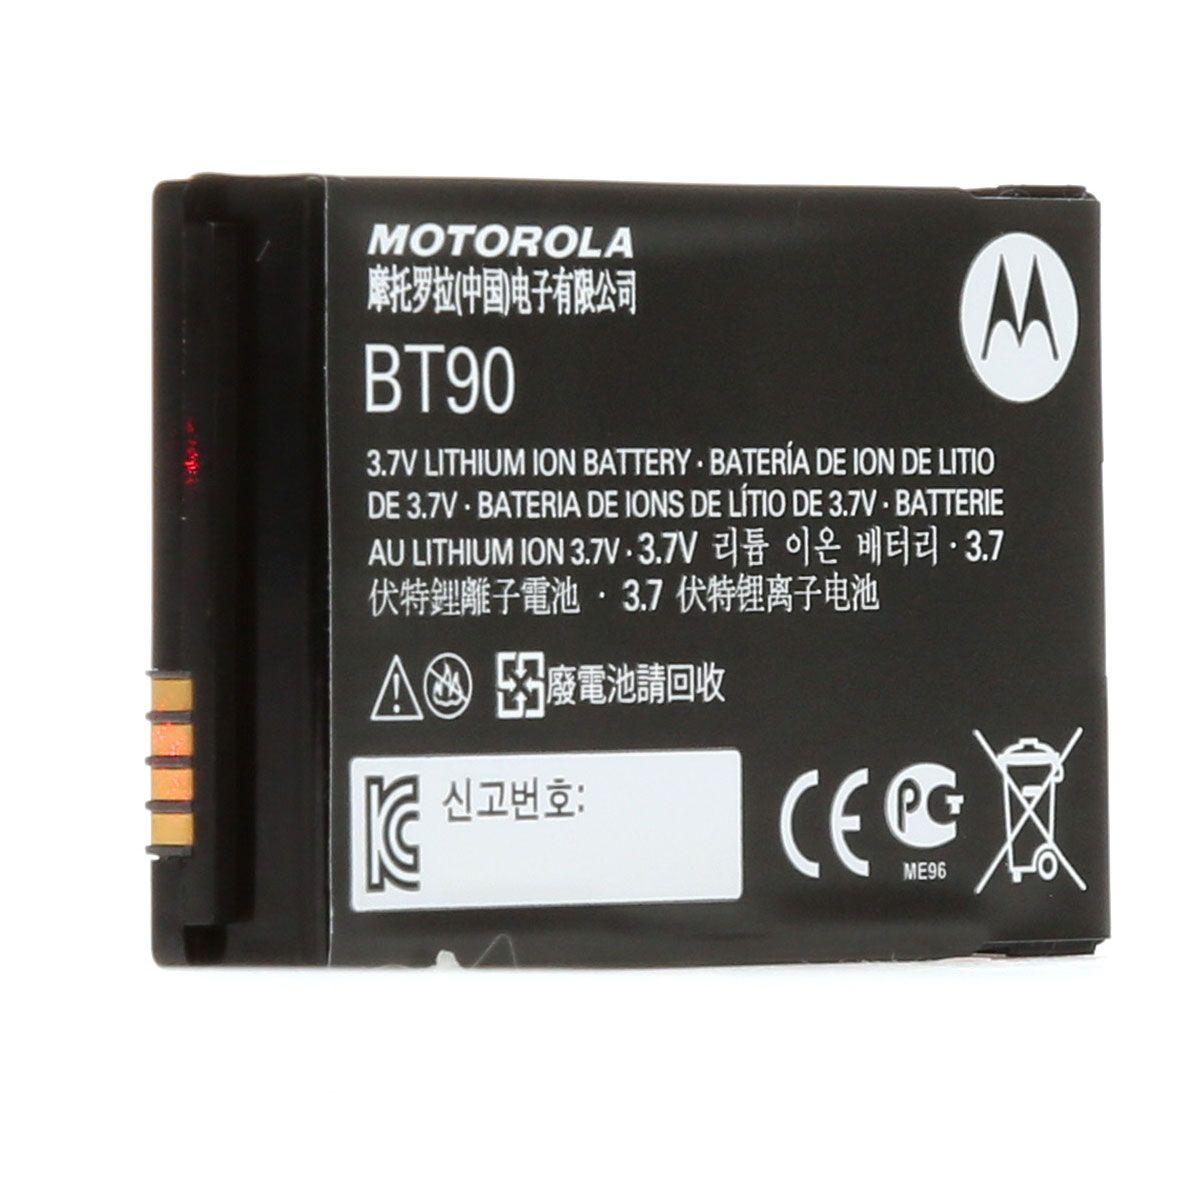 Batería Motorola Li-Ion 1800 mAh para radio SL8550e HKNN4013A